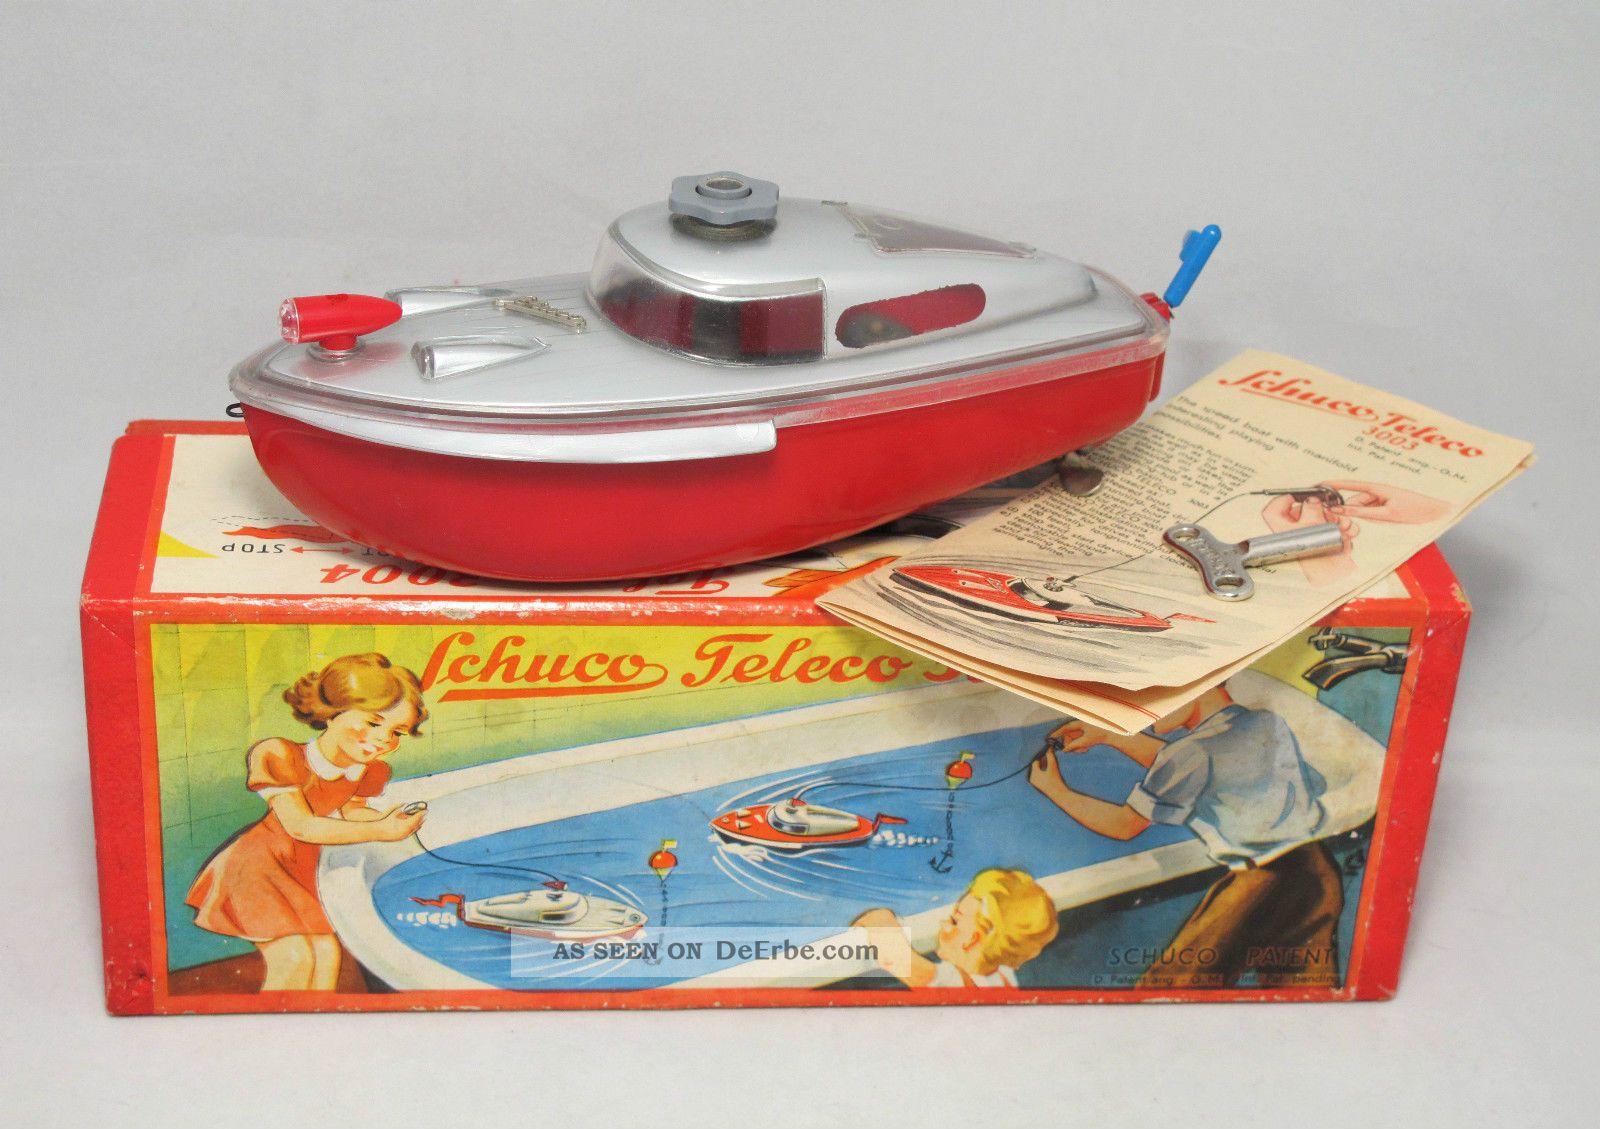 Schuco 3004 Teleco Uhrwerk Boot In Ovp 1954 Geschenkkarton / Giftbox Original, gefertigt 1945-1970 Bild